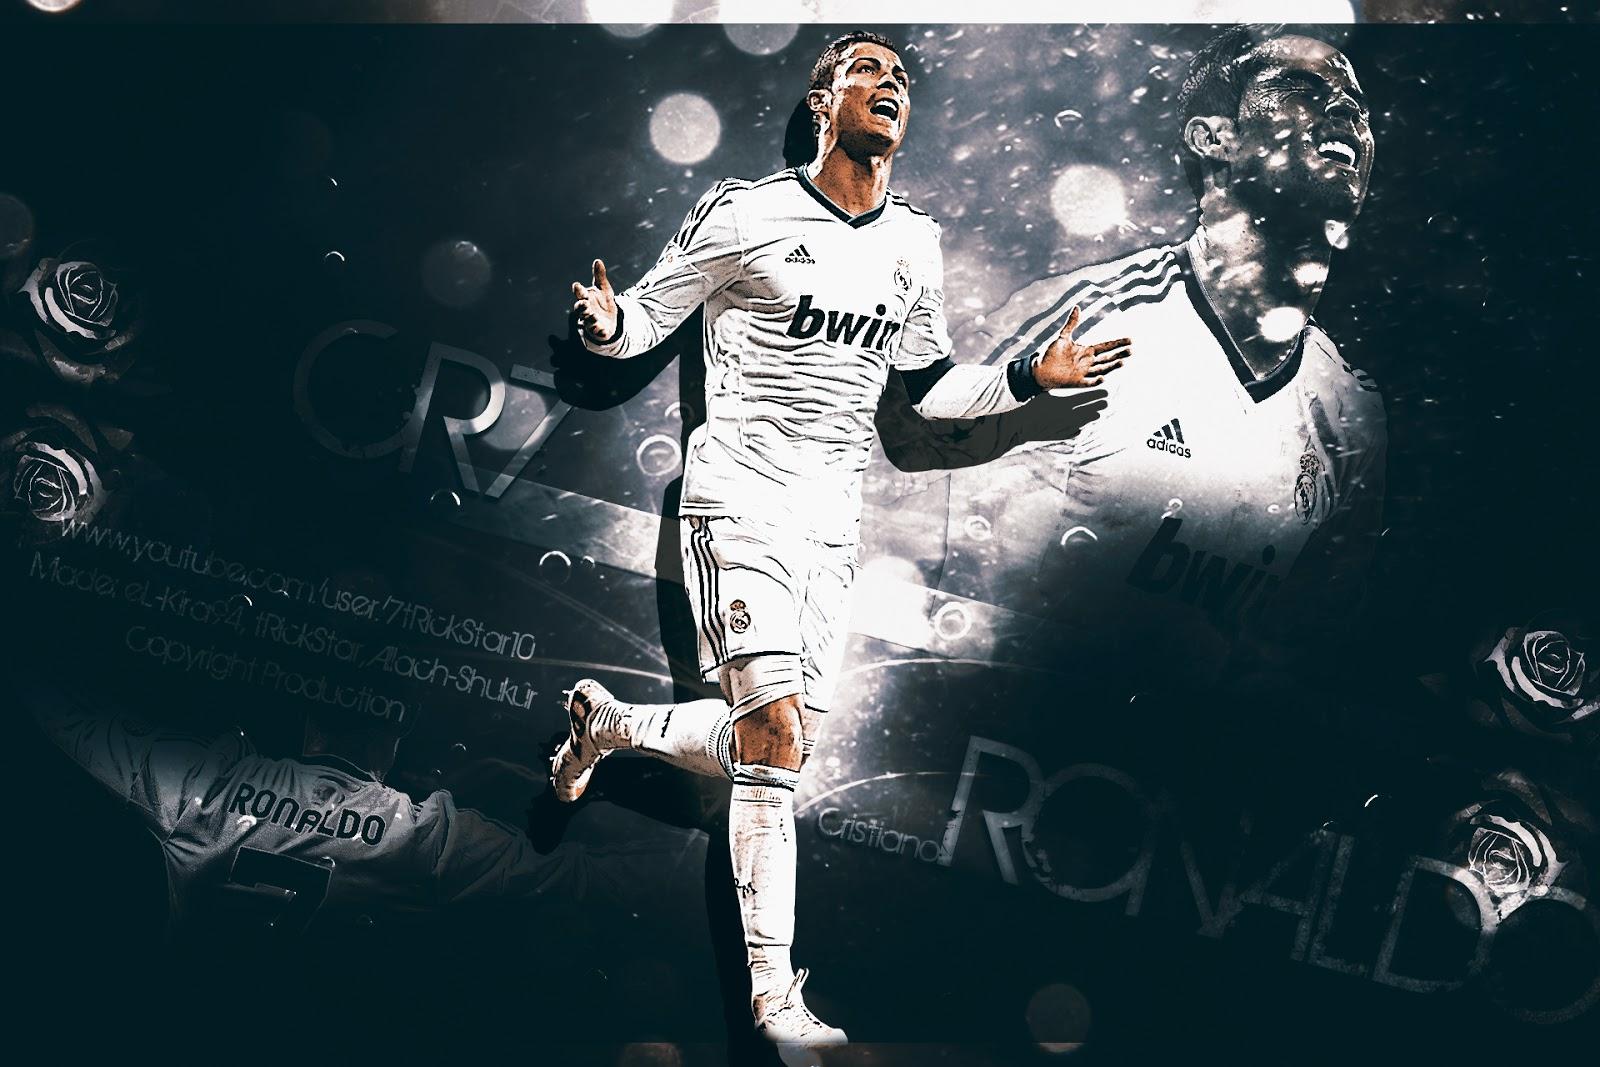 Cristiano Ronaldo New HD Wallpapers 2014 2015 1600x1067